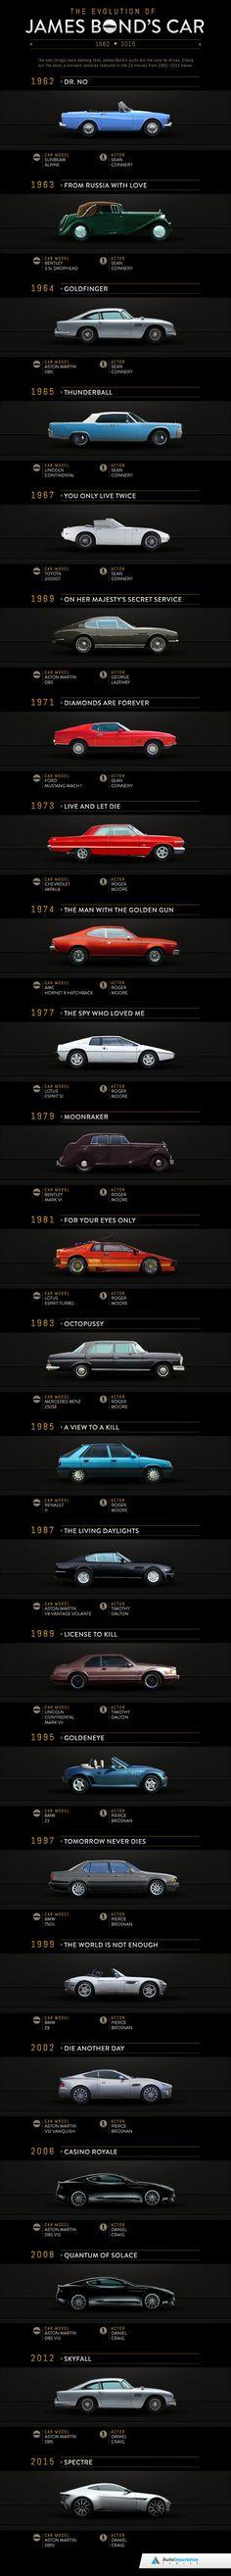 The Evolution of James Bond's Car!